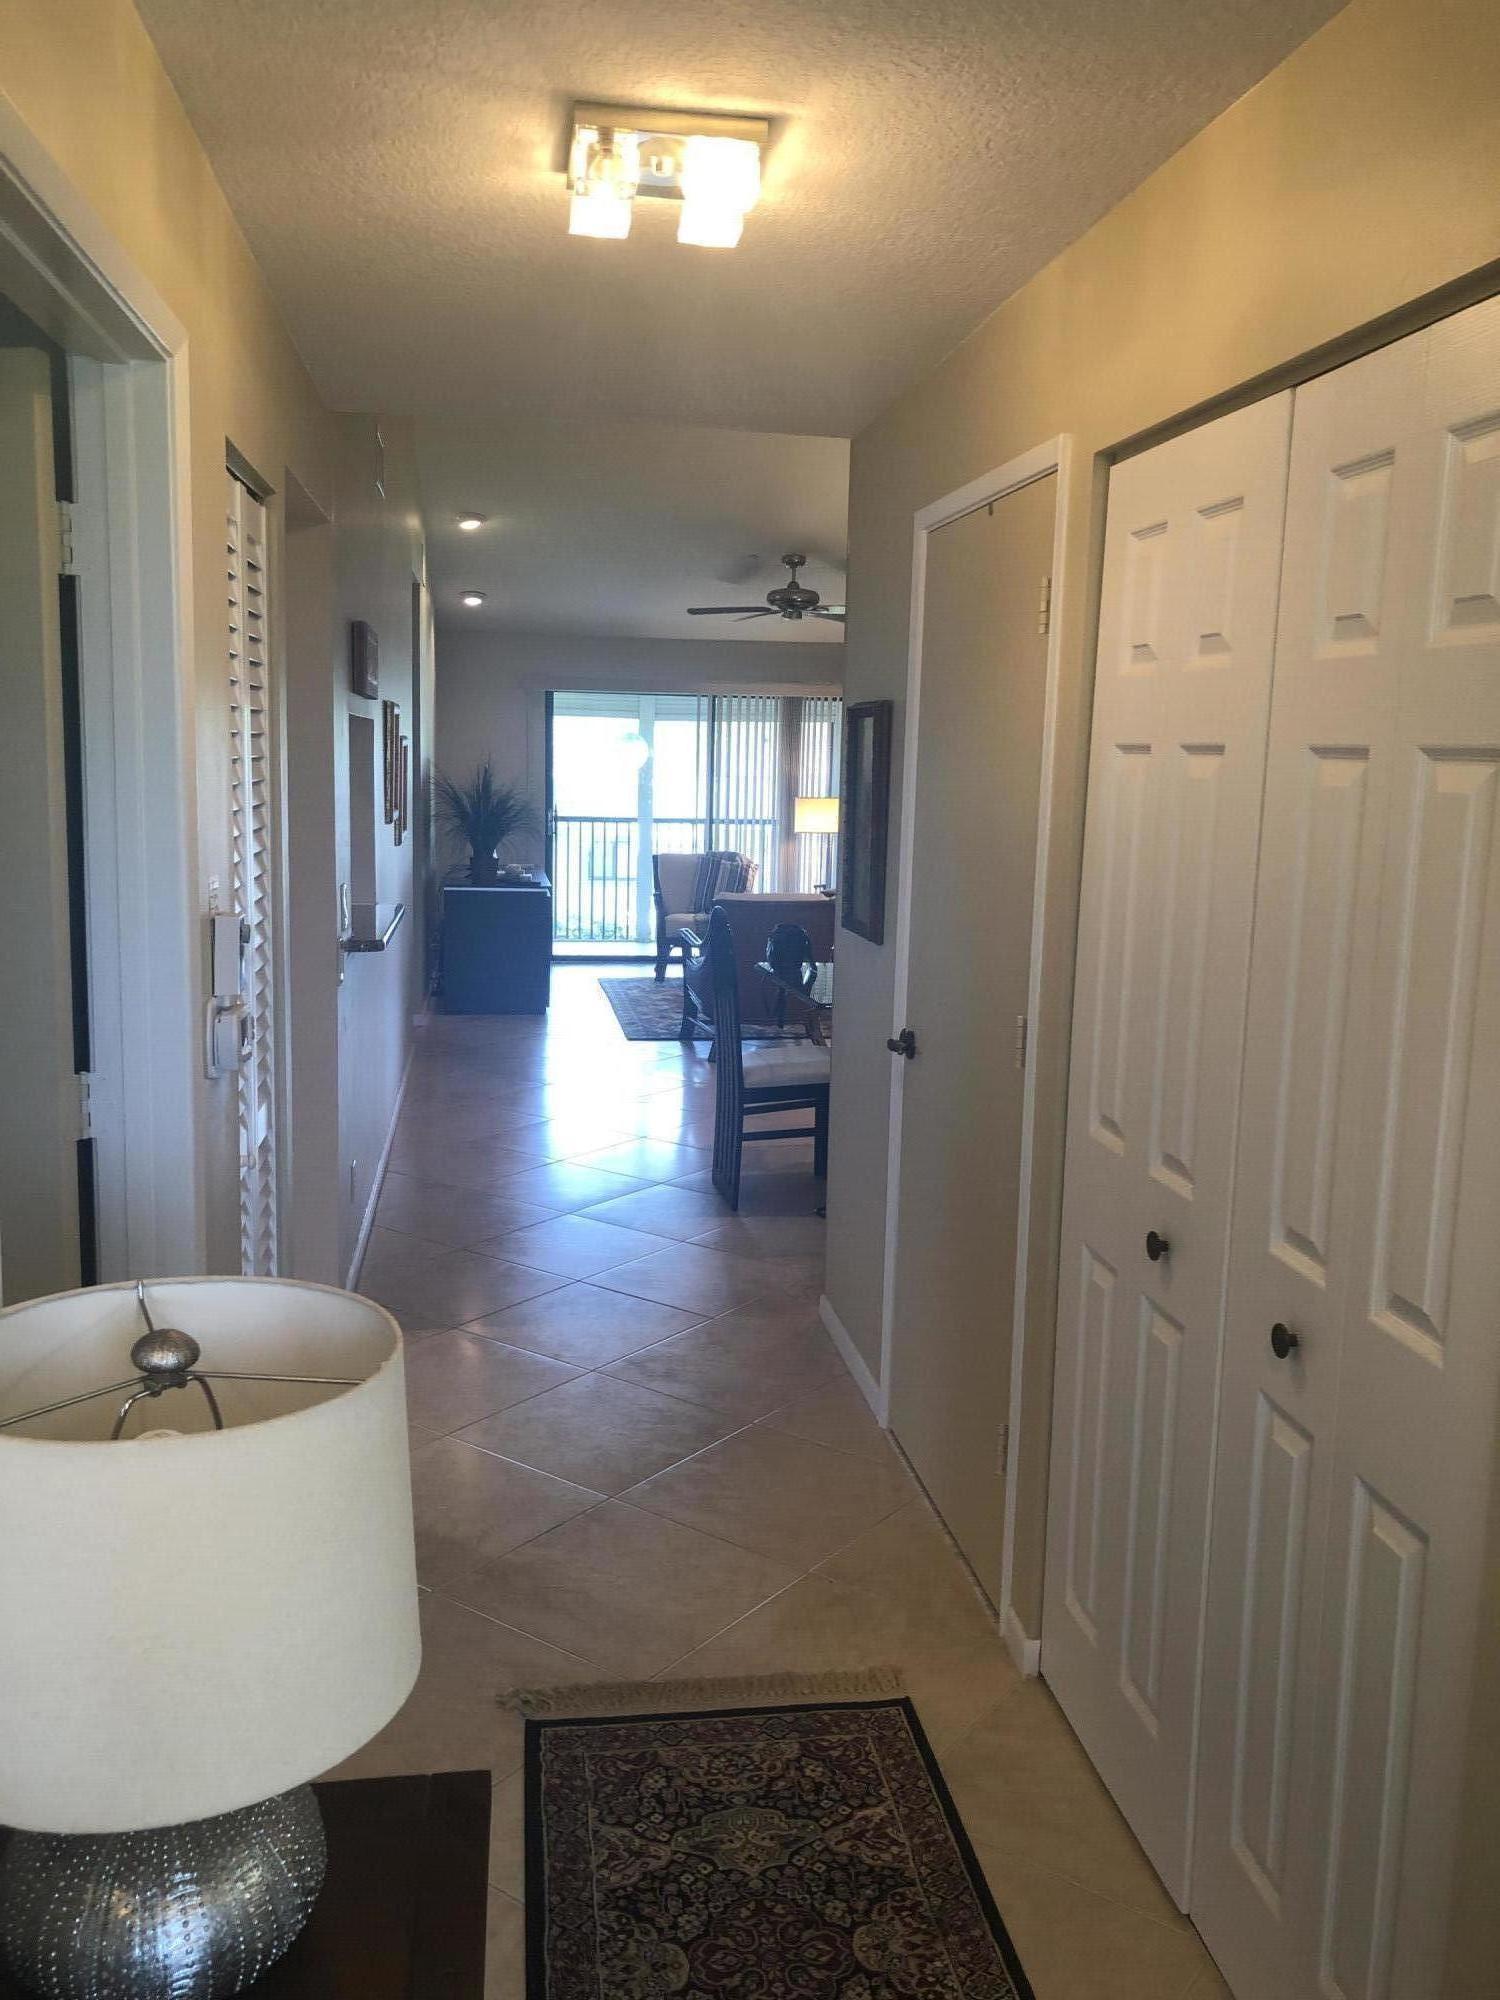 Details for 15364 Lakes Of Delray Boulevard 75, Delray Beach, FL 33484